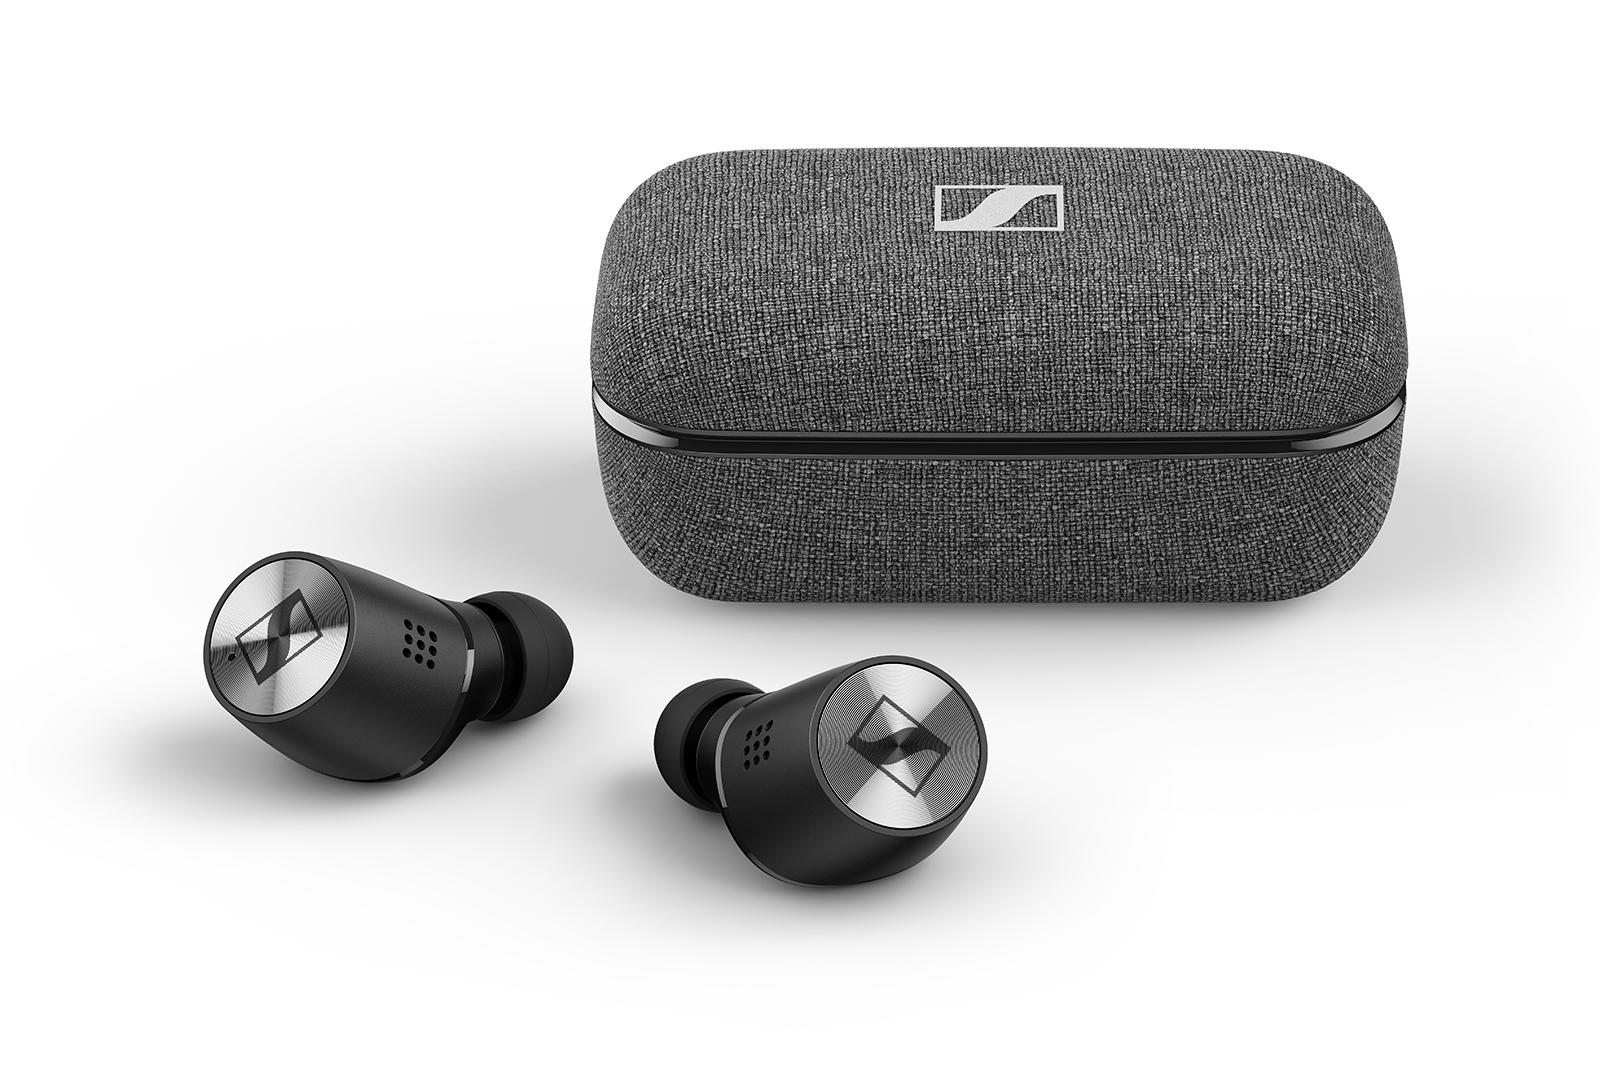 Sennheiser เปิดตัว MOMENTUM True Wireless หูฟังไร้สายระดับรางวัลรุ่นที่ 2 เตรียมวางจำหน่าย 7 พ.ค.นี้